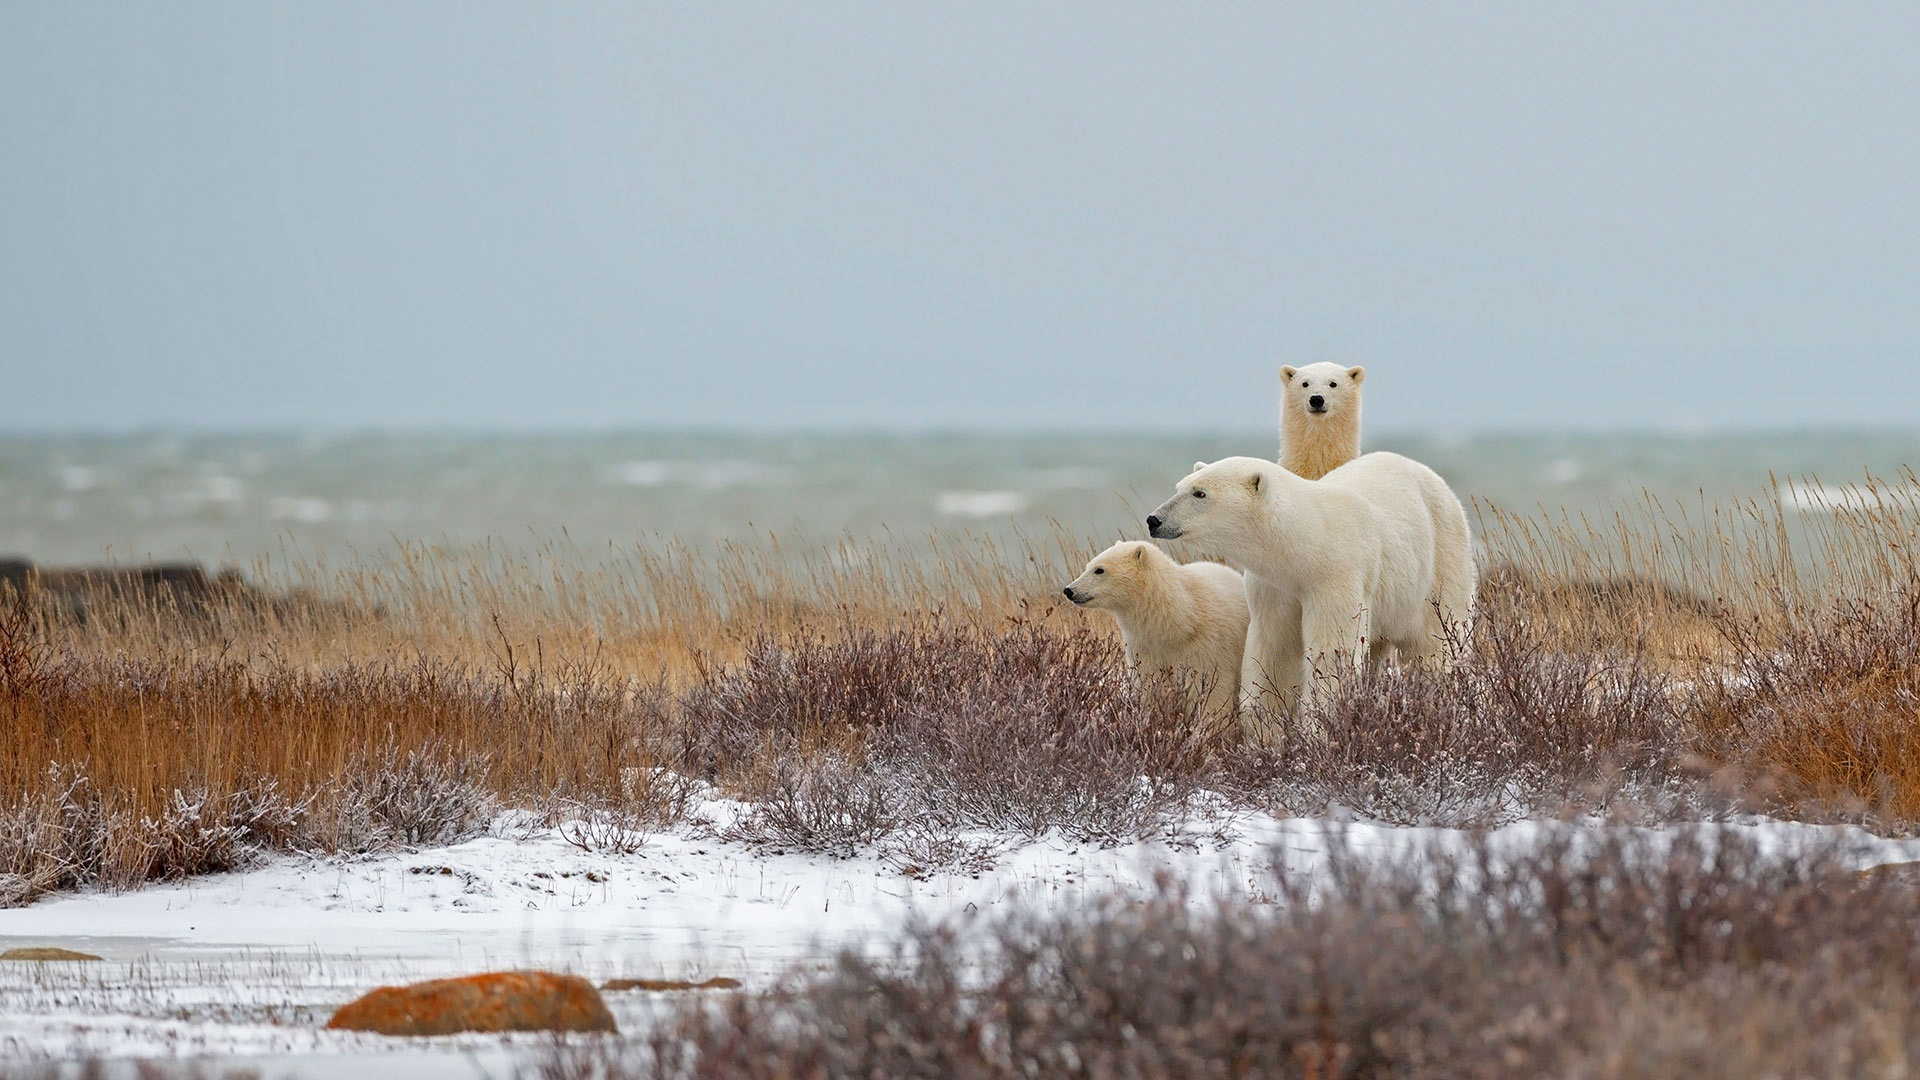 Polar bear family wallpaper